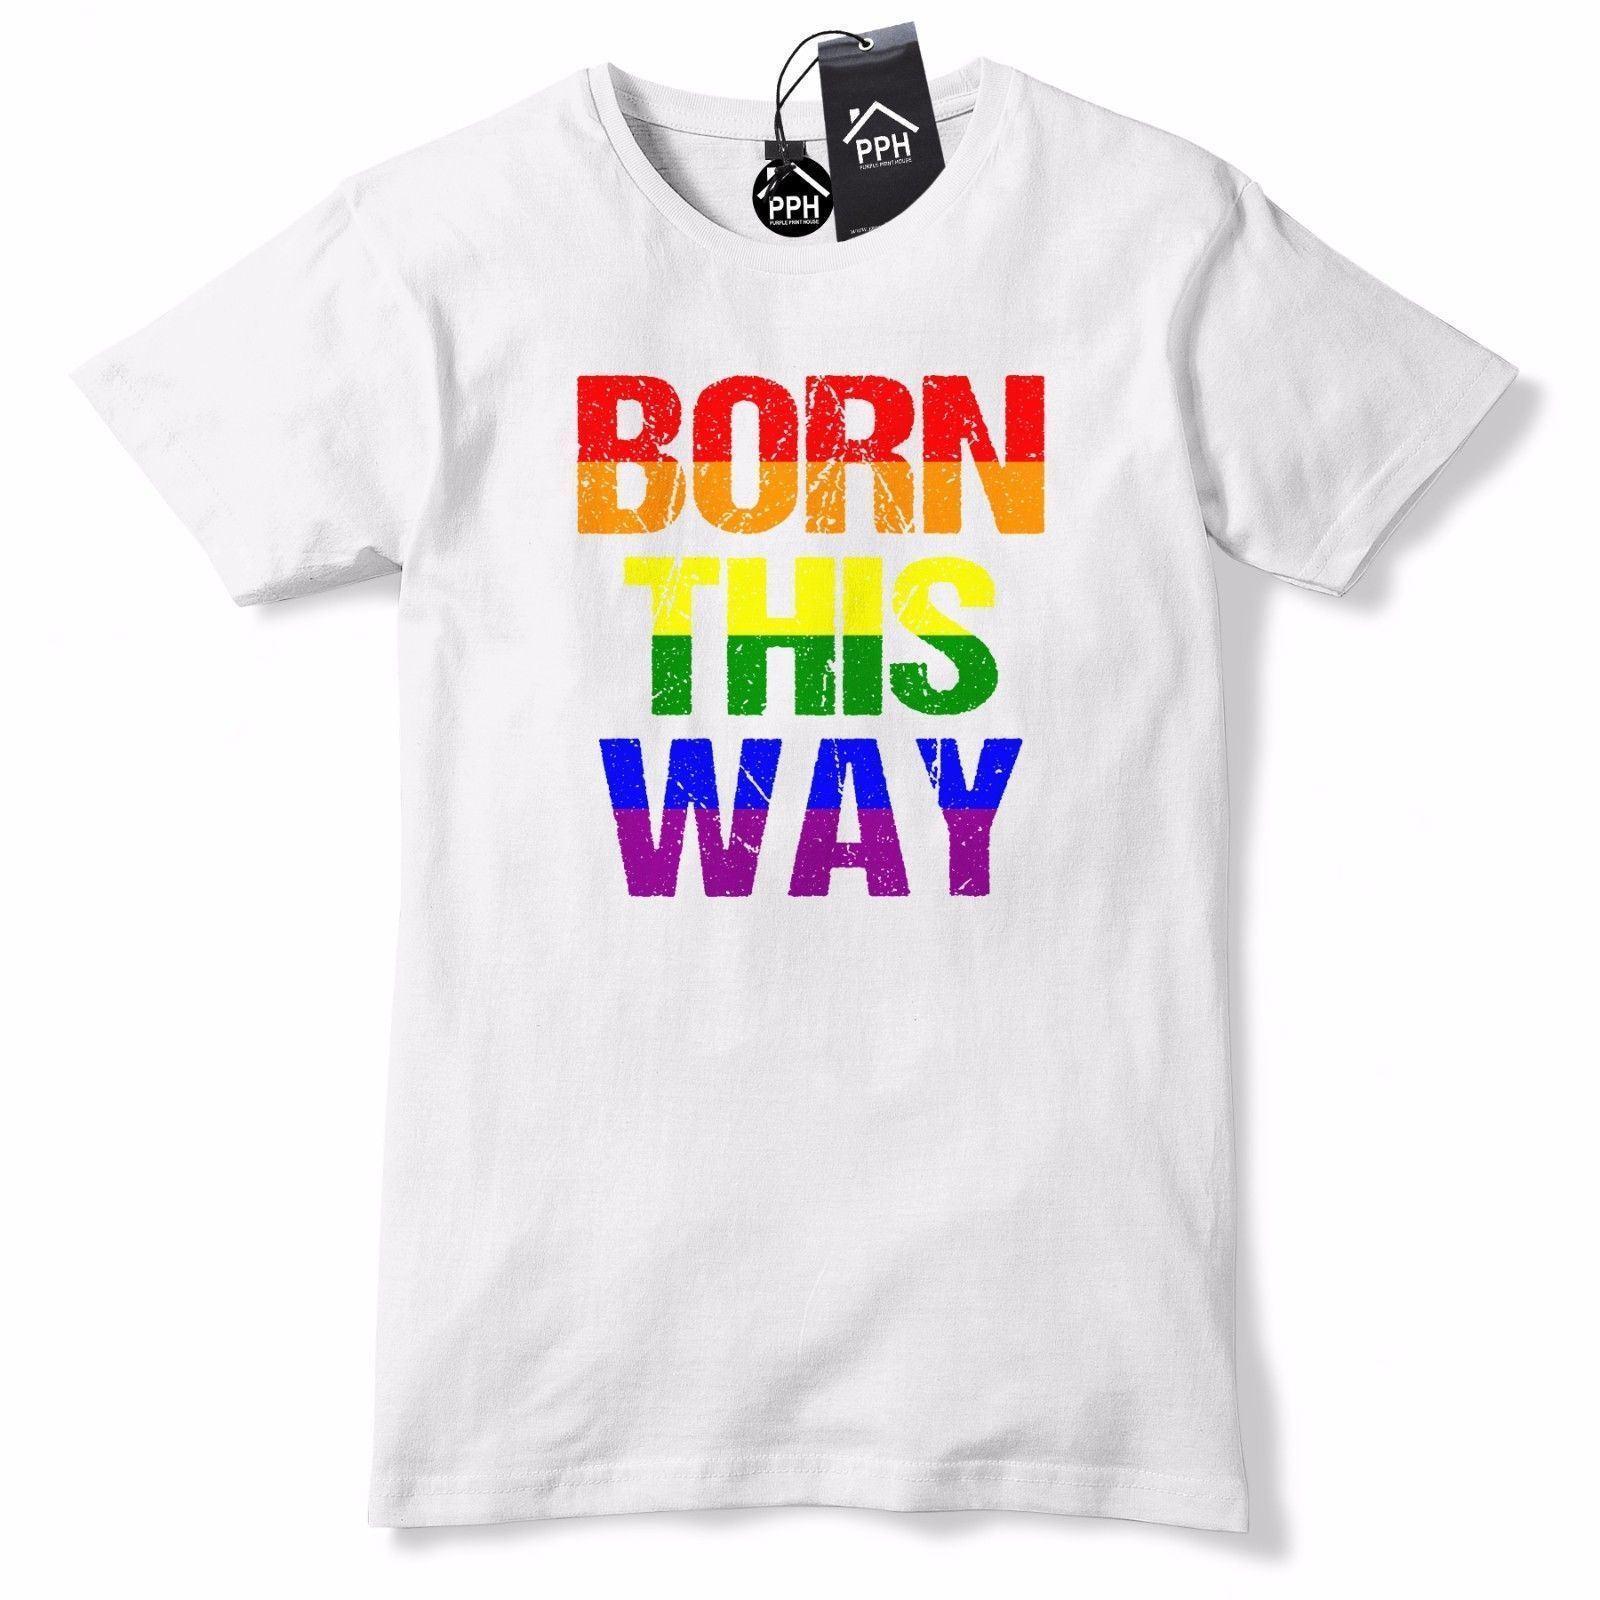 e93a0520fd0e8 Born This Way Gay Pride T Shirt Rainbow Tshirt Lesbian Glitter LGBT  Festival 671 Tees Custom Jersey t shirt